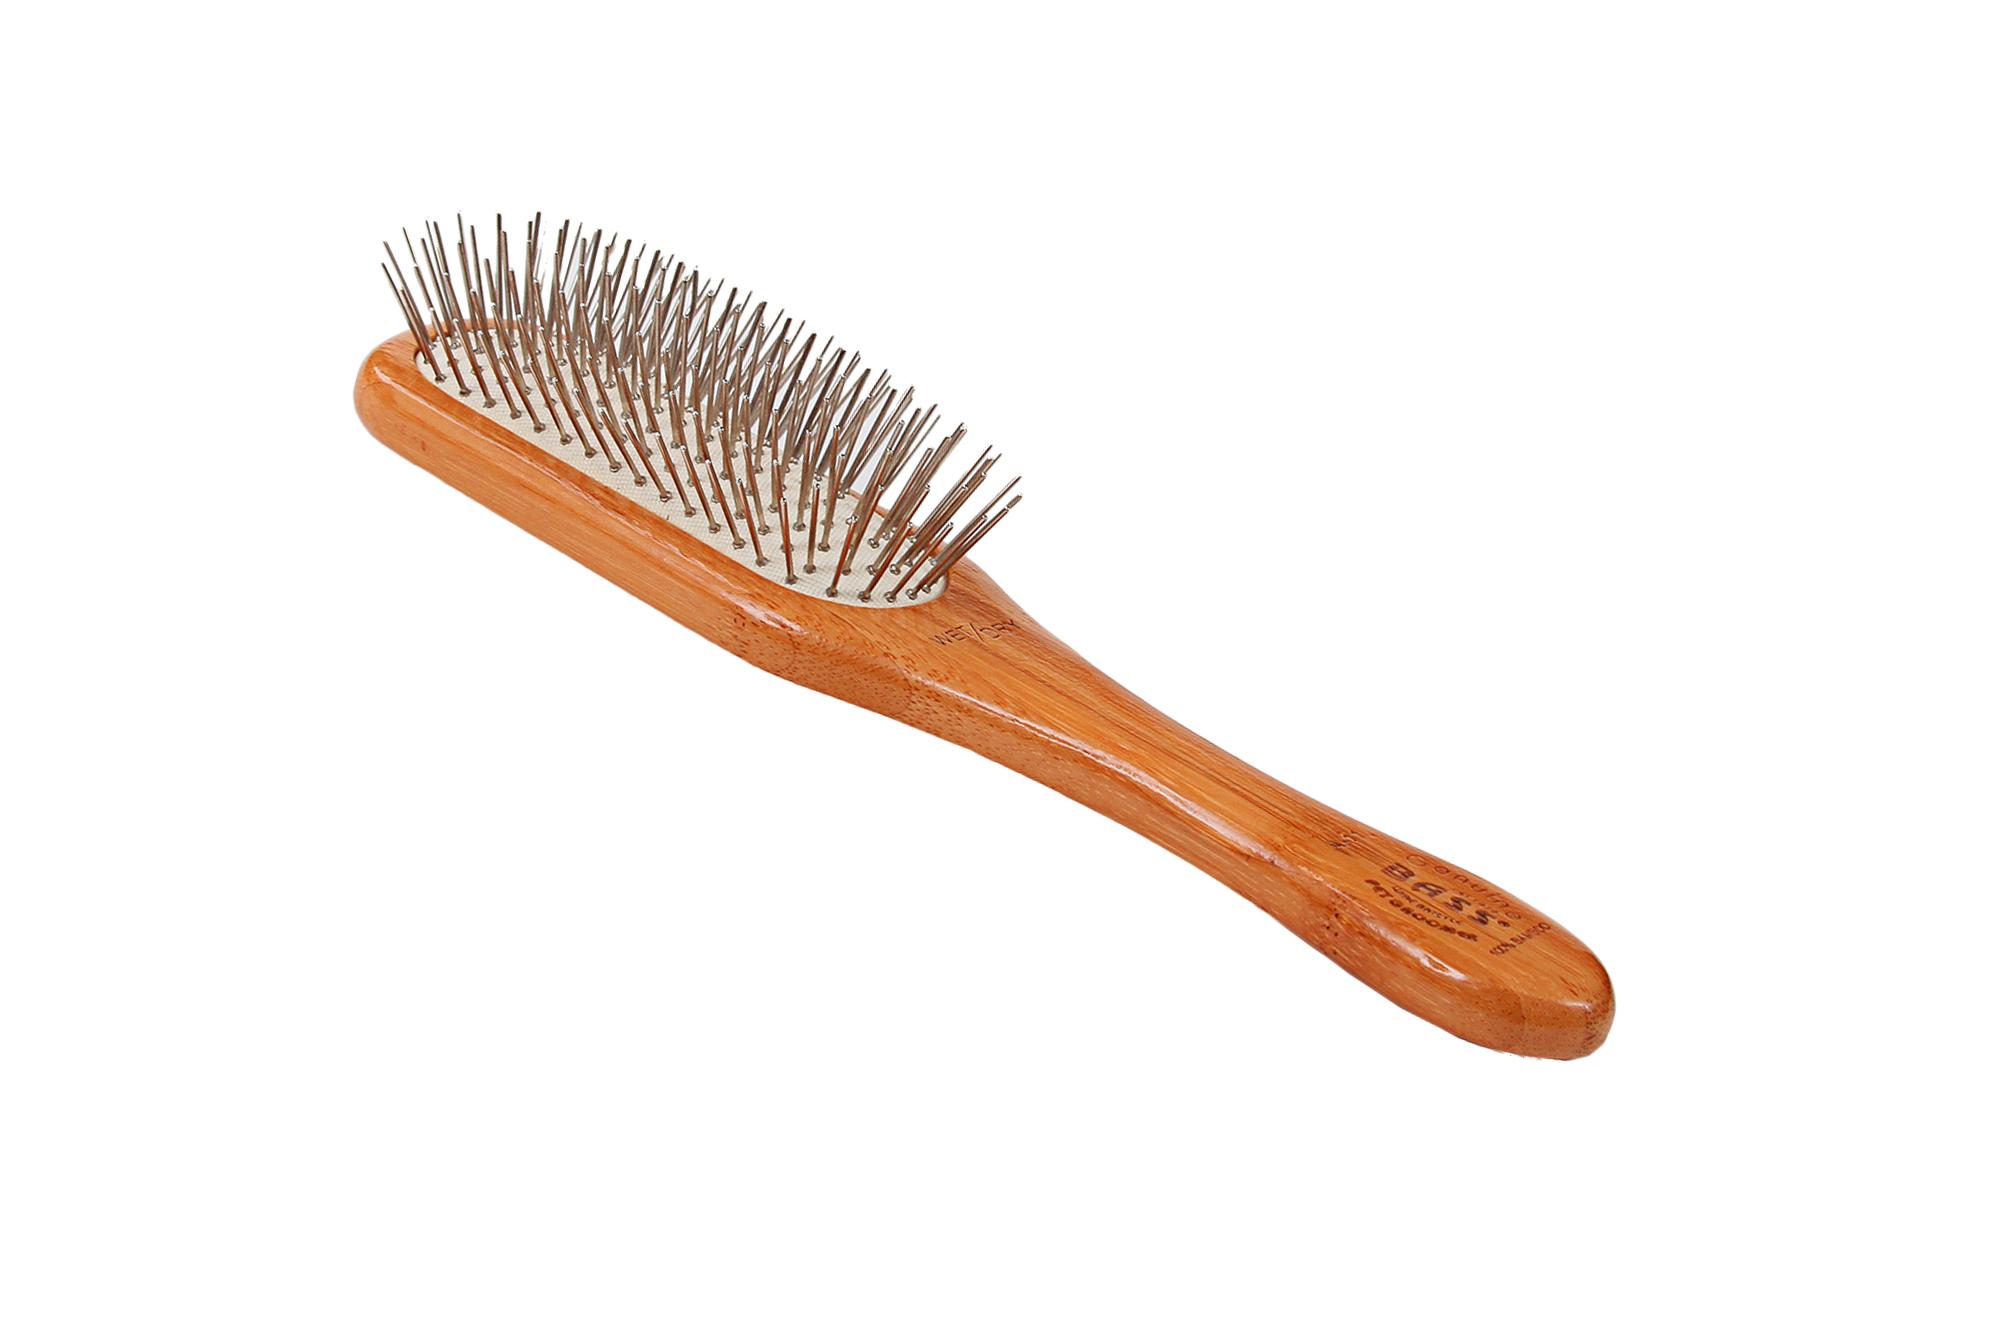 A11 Bamboo Alloy Pin Brush 3